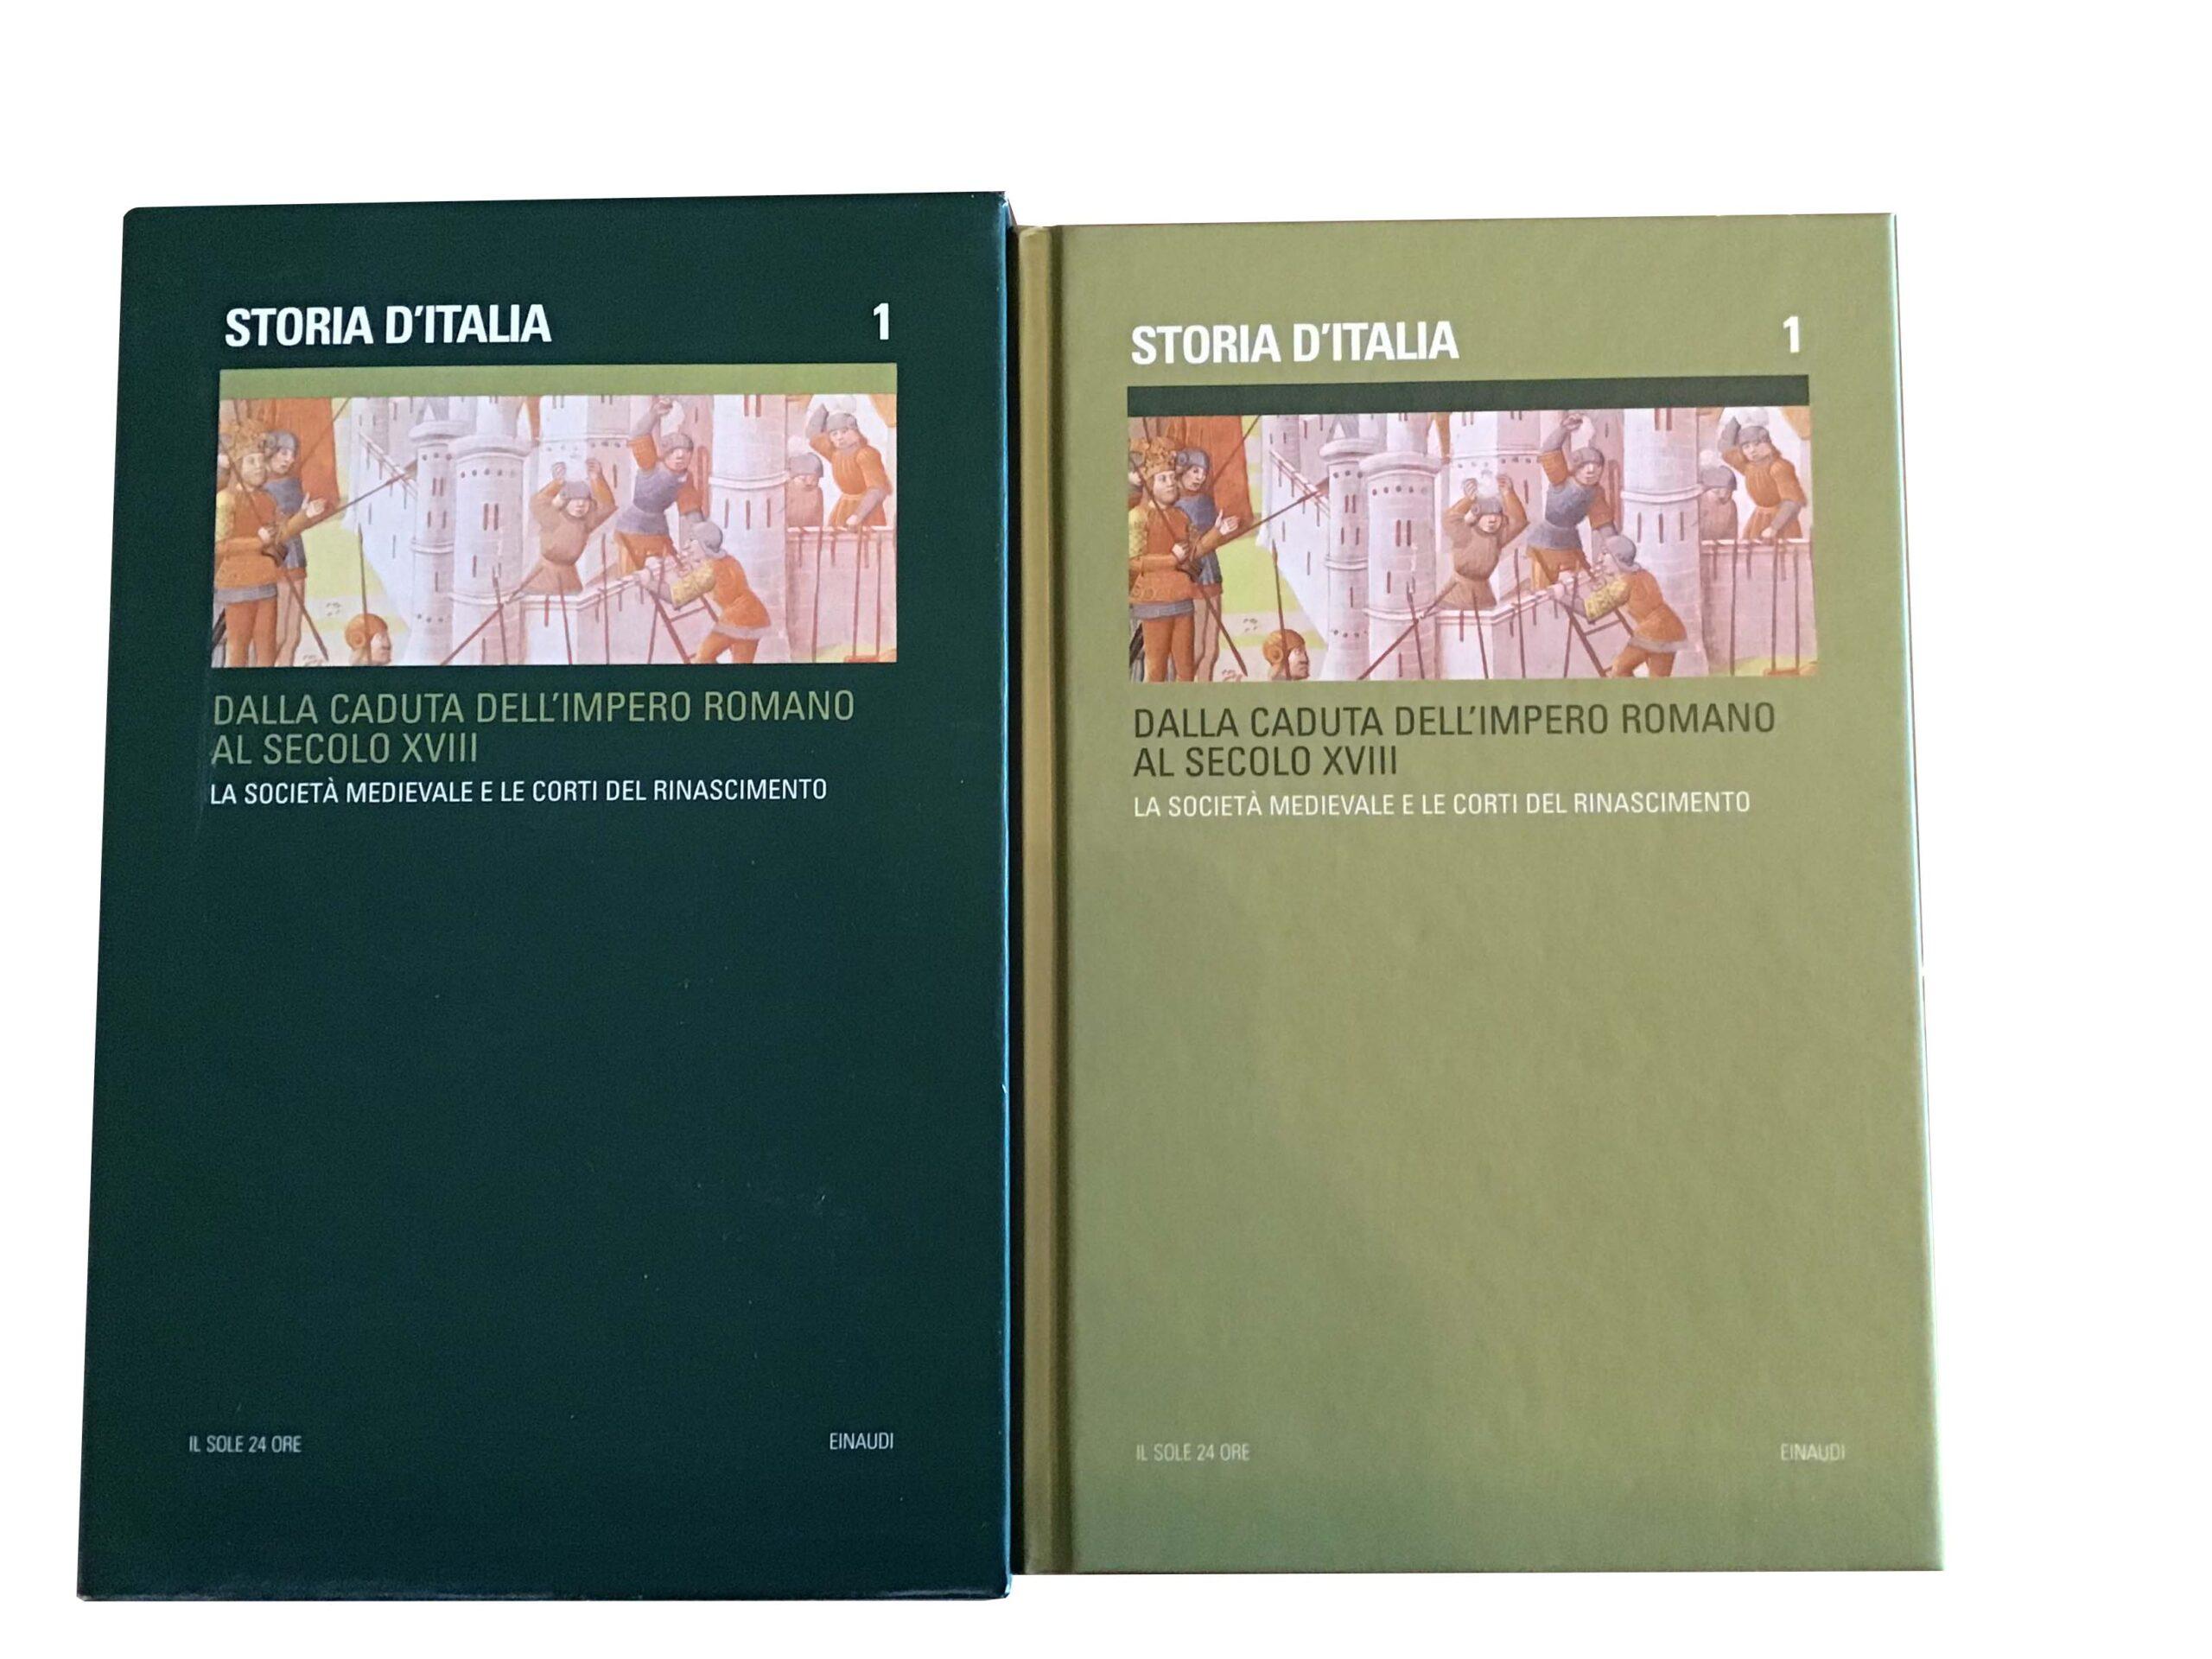 Storia d'Italia – Einaudi